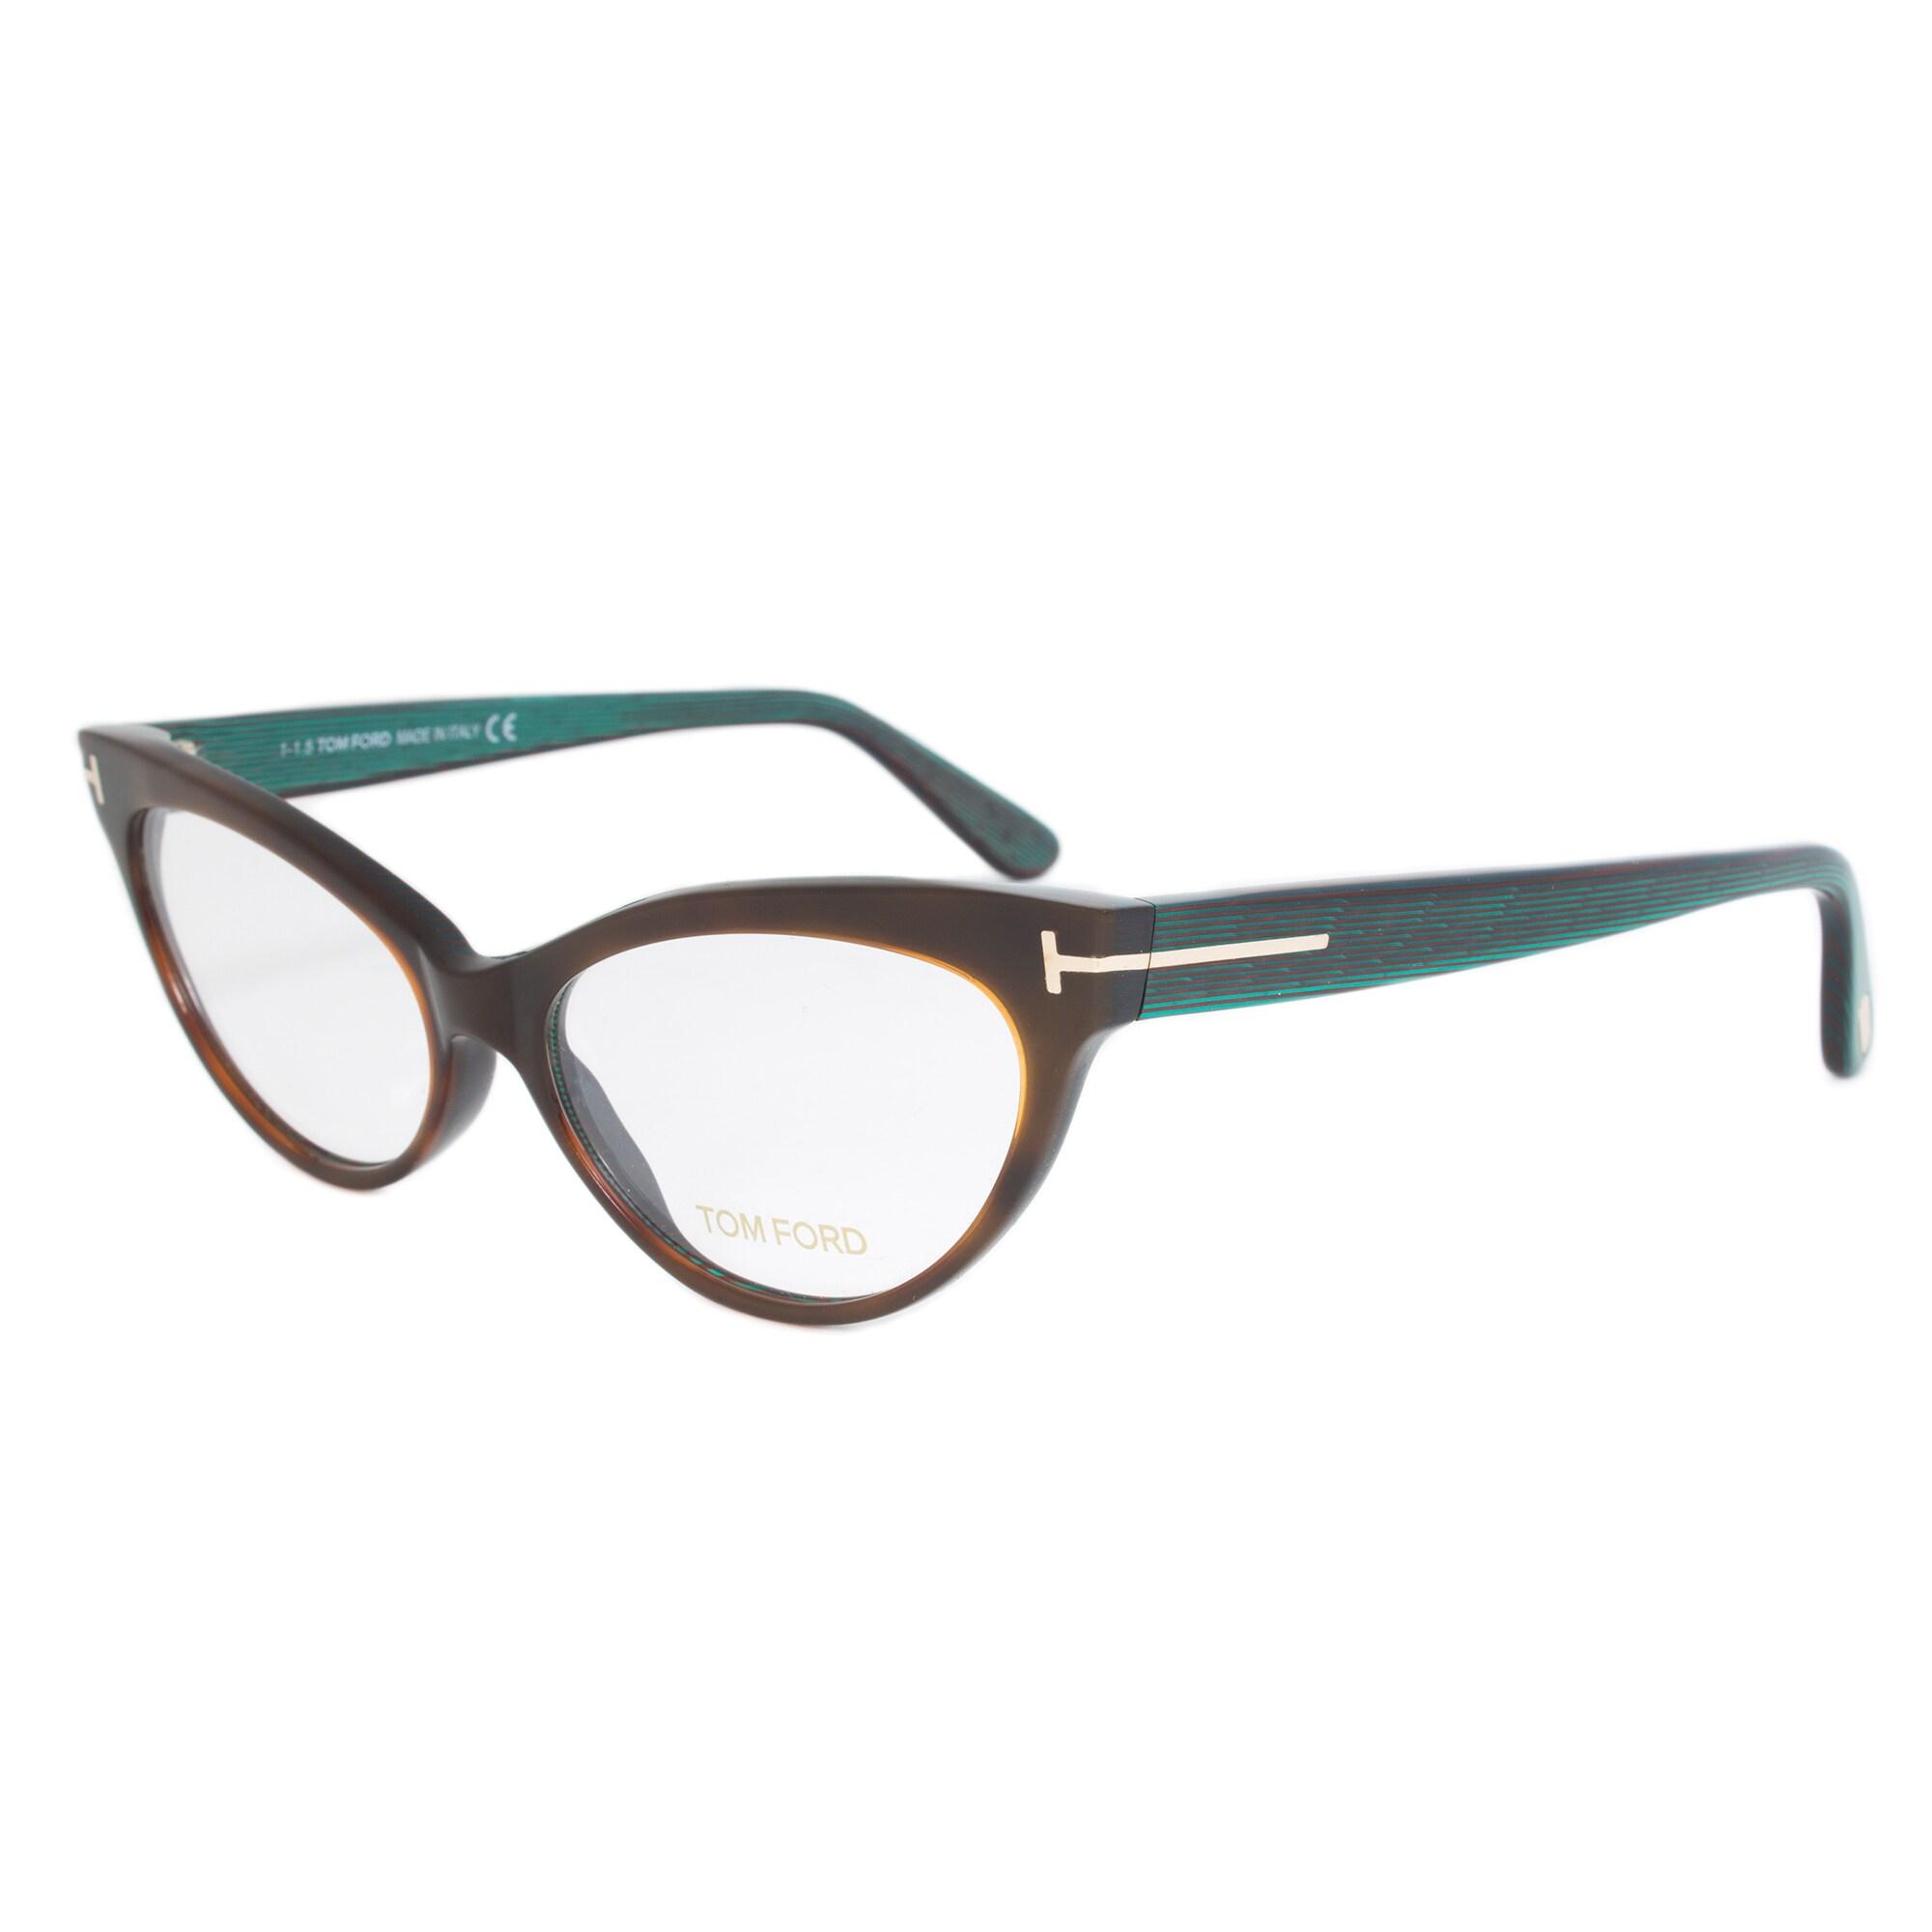 Tom Ford FT5317 052 Eyeglasses Frame - Free Shipping Today ...